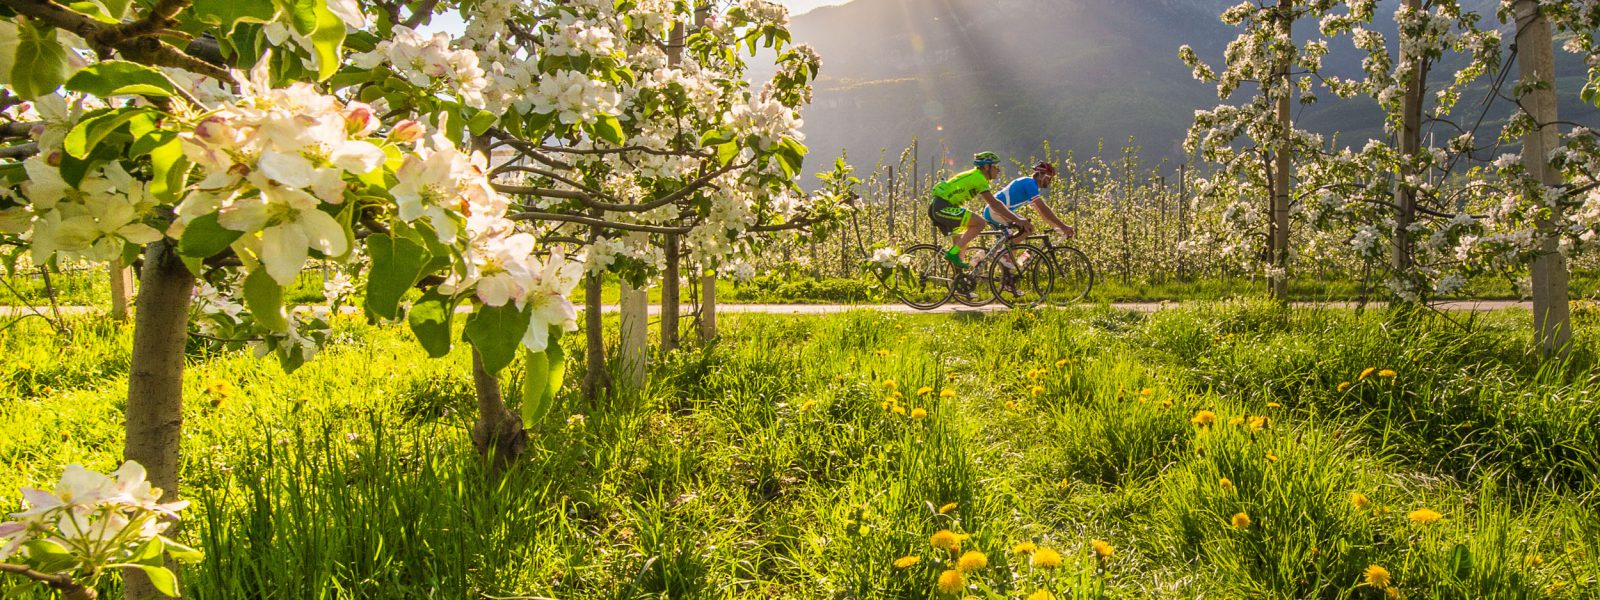 Rennrad Blüte Frühling